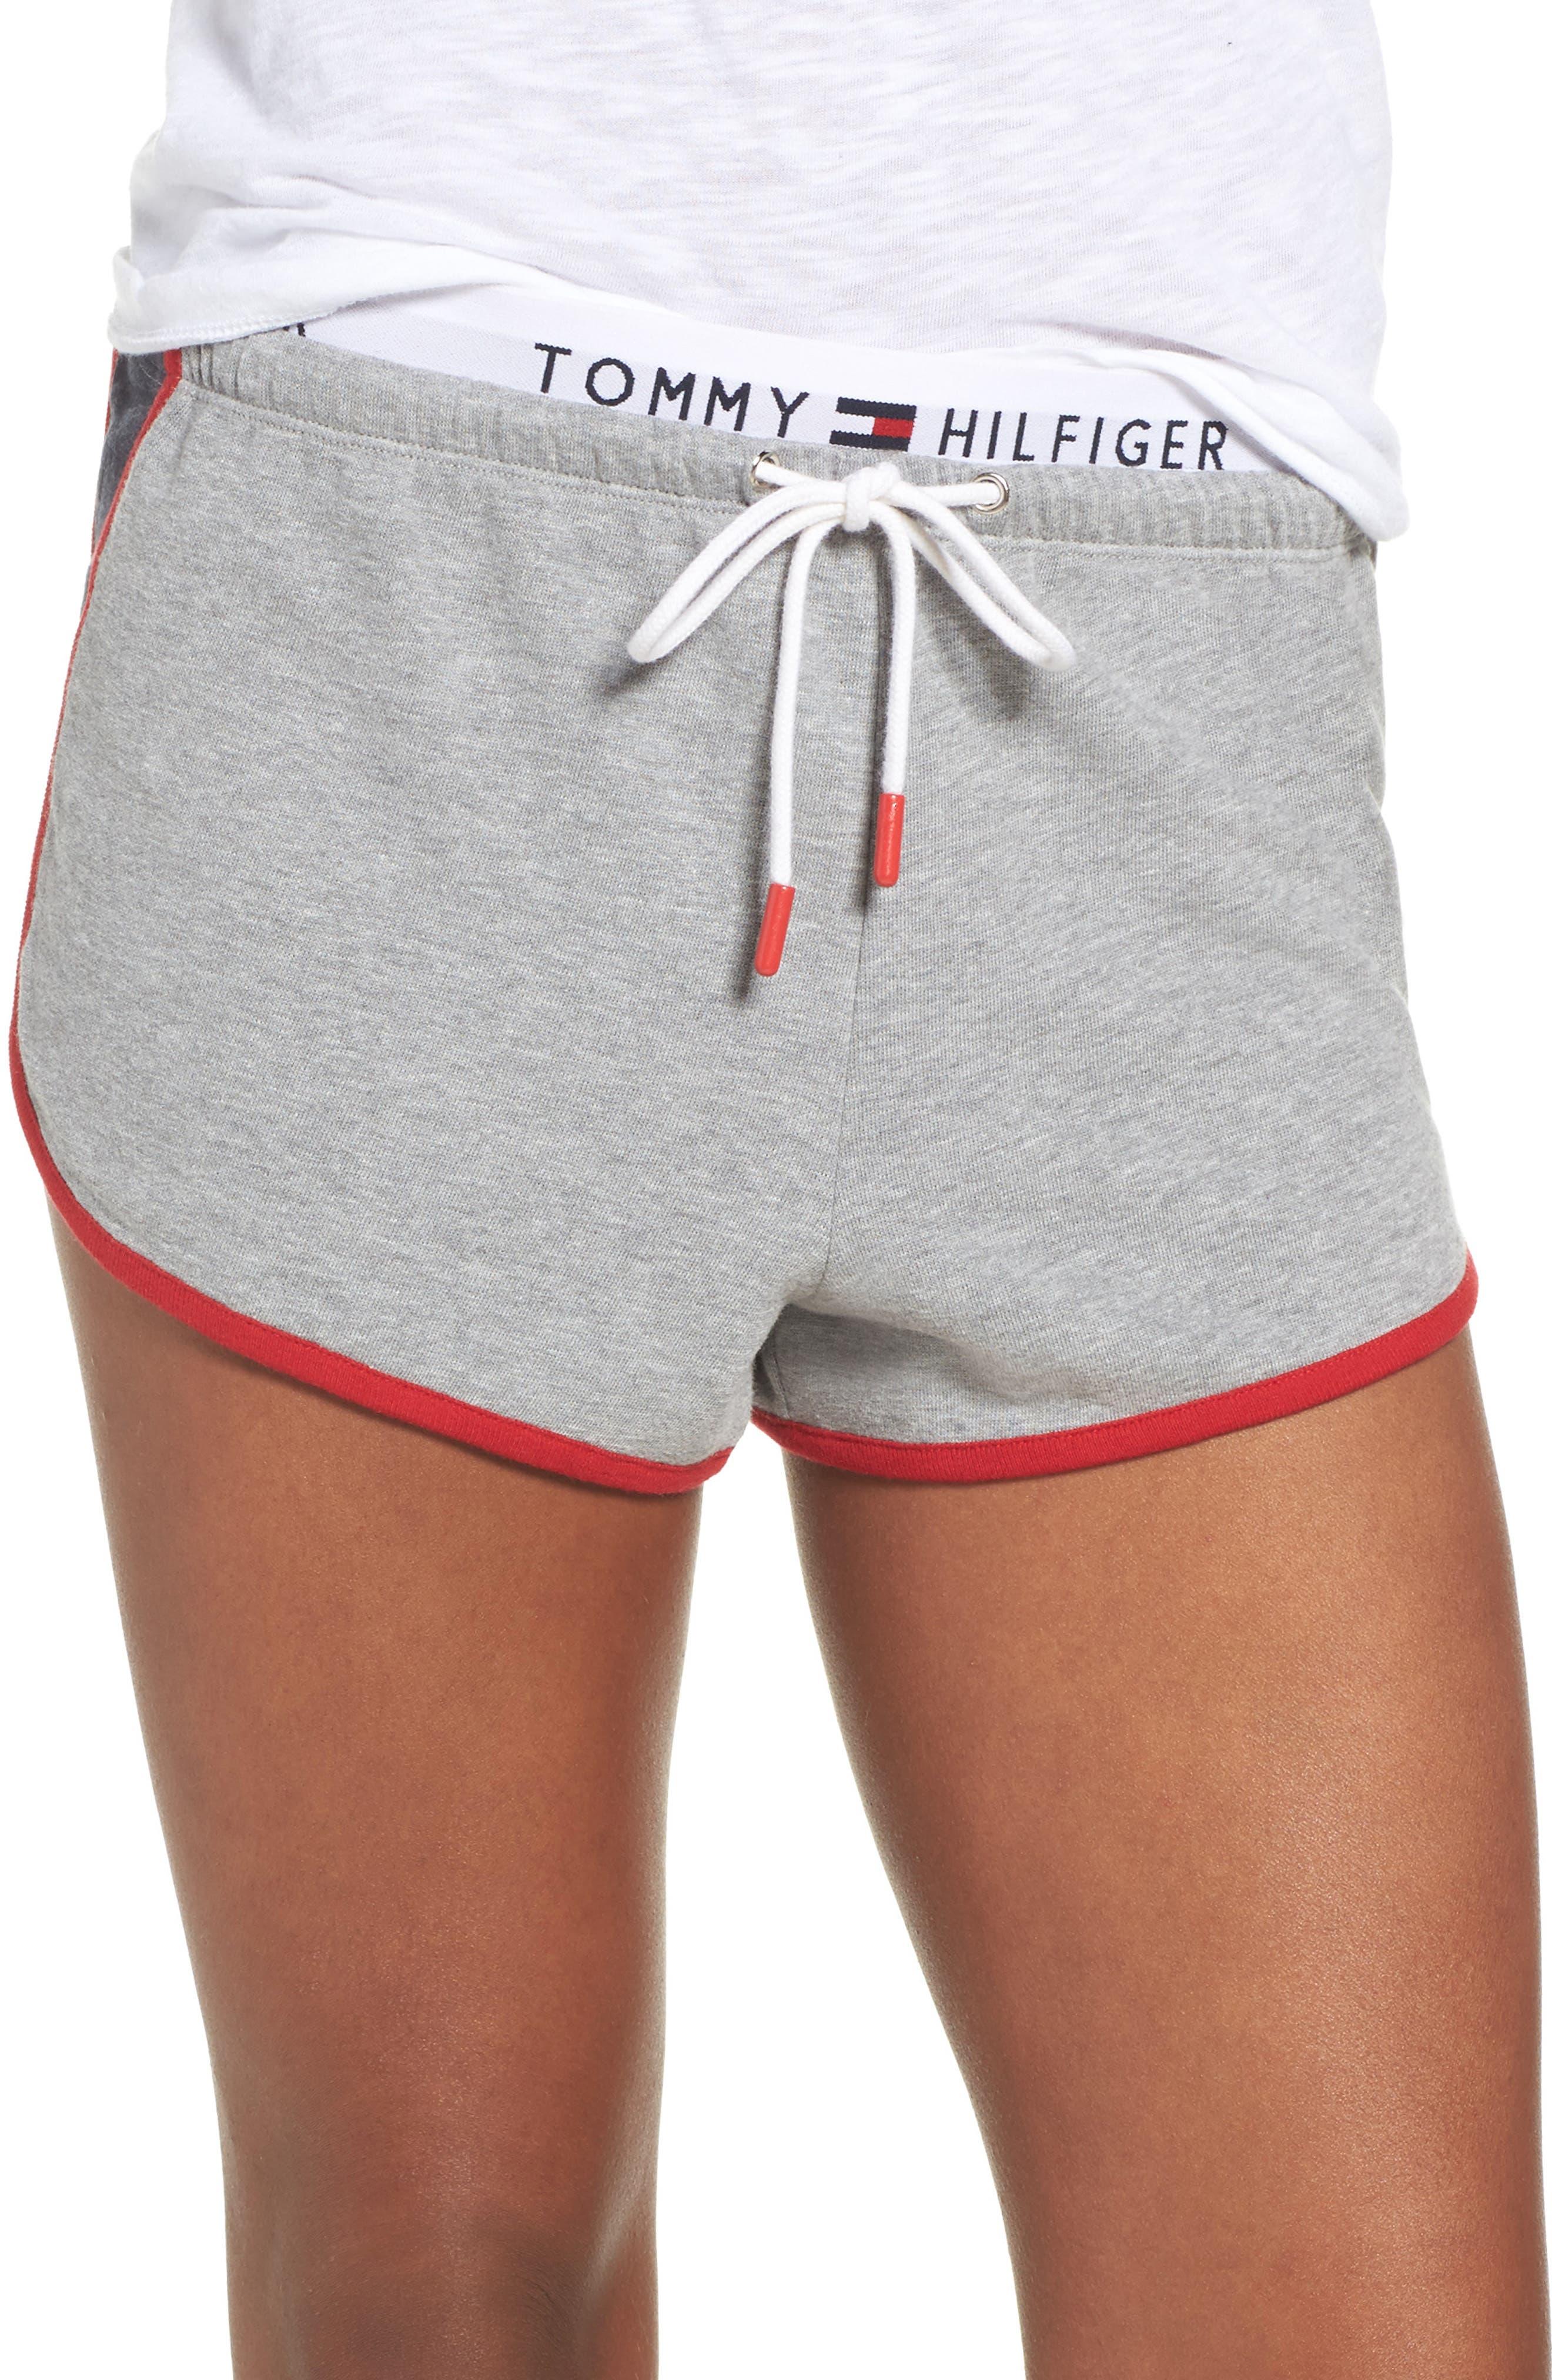 Main Image - Tommy Hilfiger TH Retro Shorts